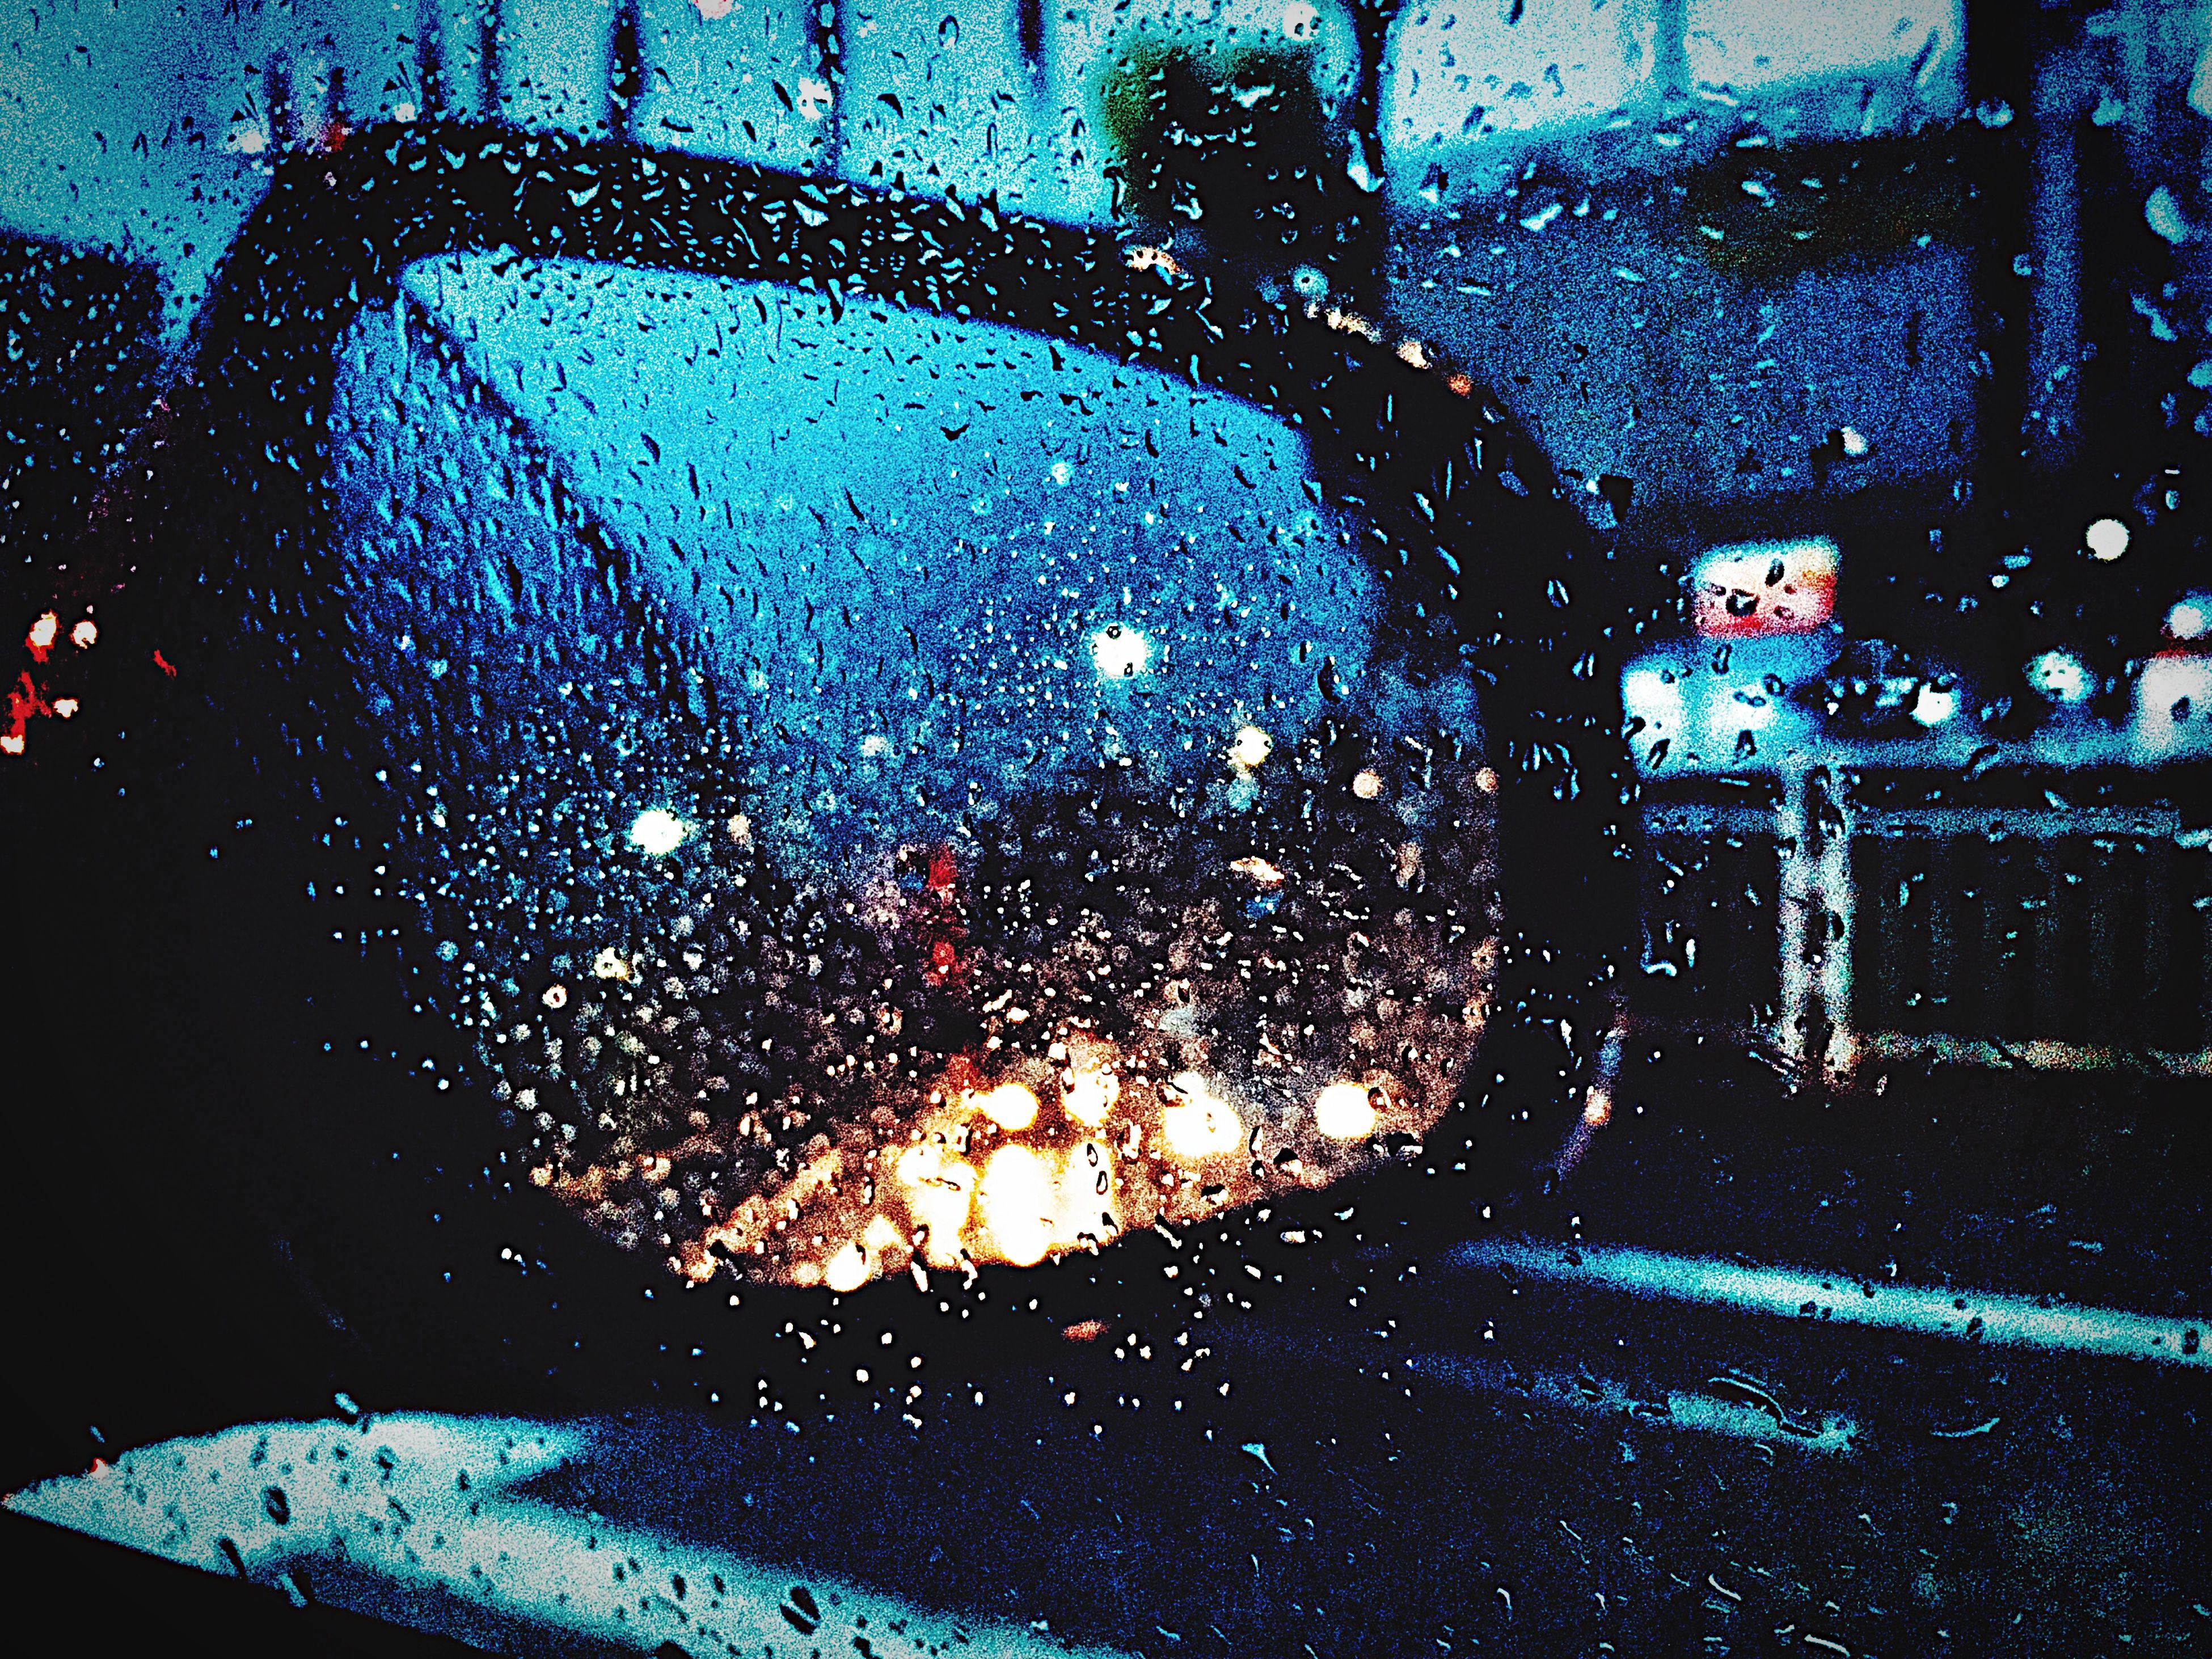 transportation, land vehicle, mode of transport, car, vehicle interior, glass - material, window, wet, transparent, drop, indoors, car interior, rain, windshield, season, water, close-up, side-view mirror, raindrop, street